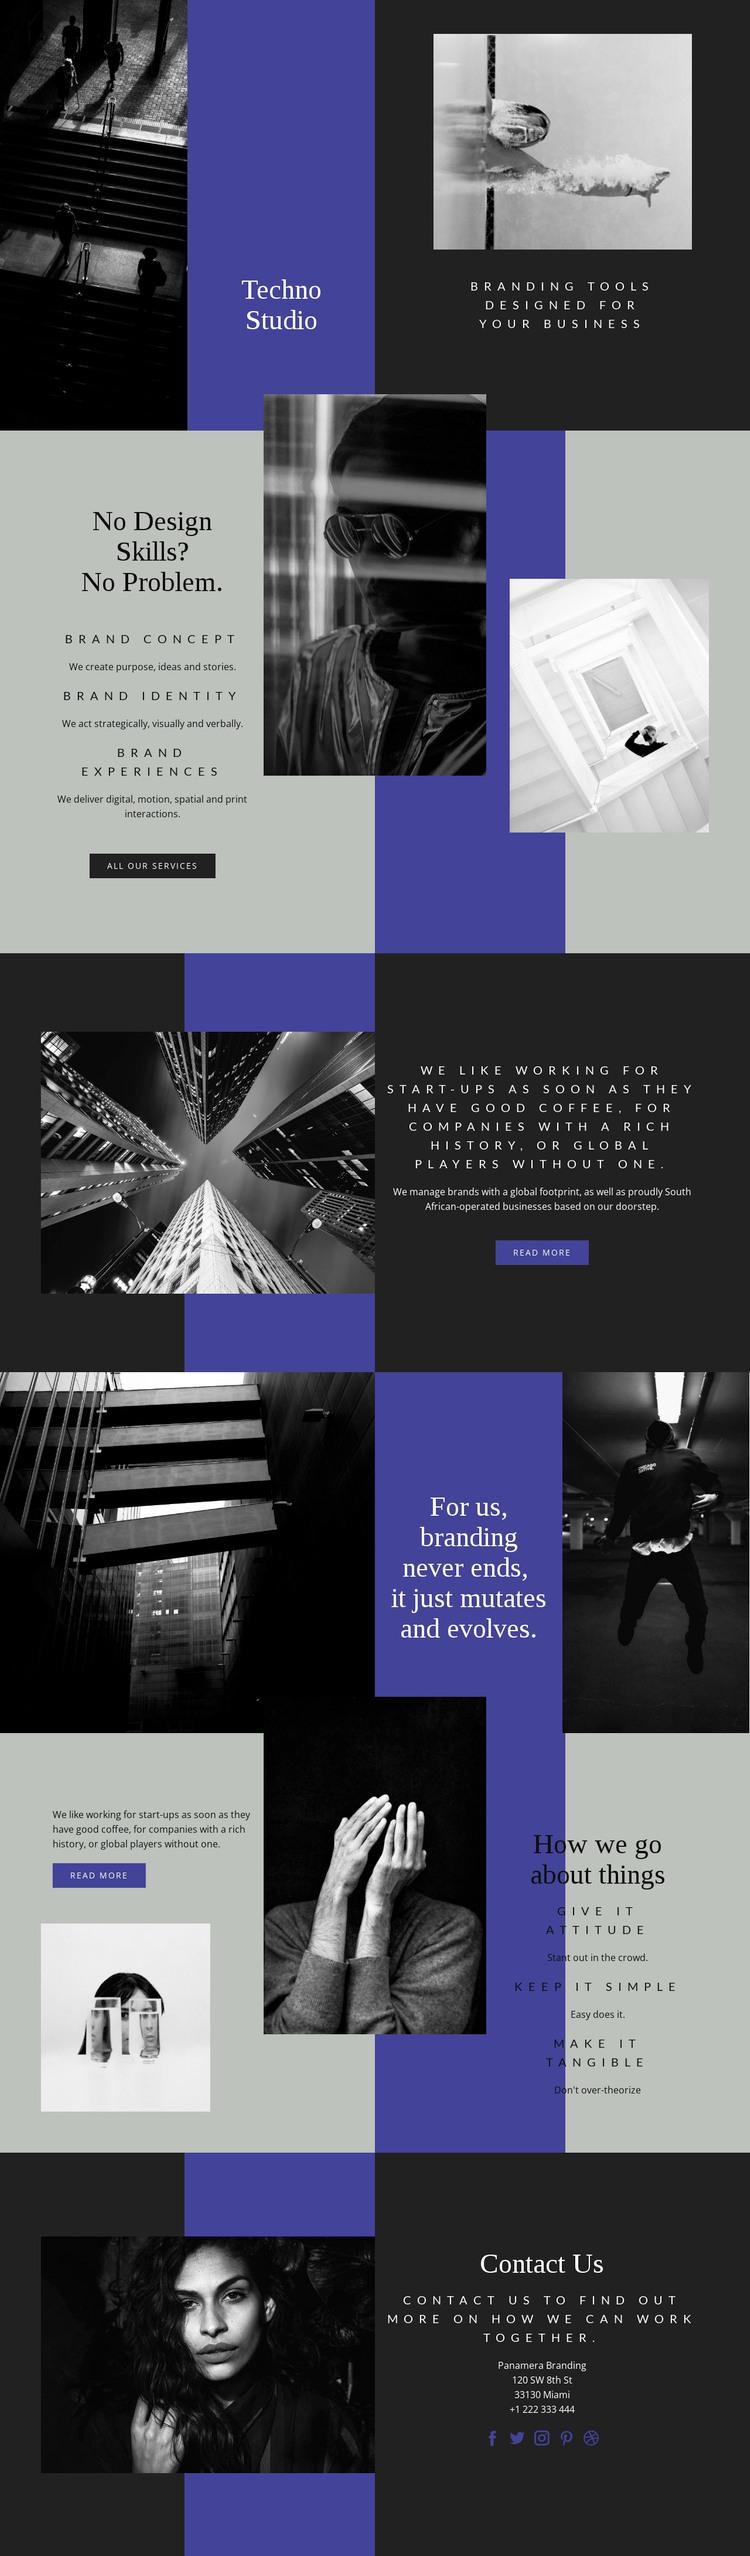 Techno skills in business WordPress Theme